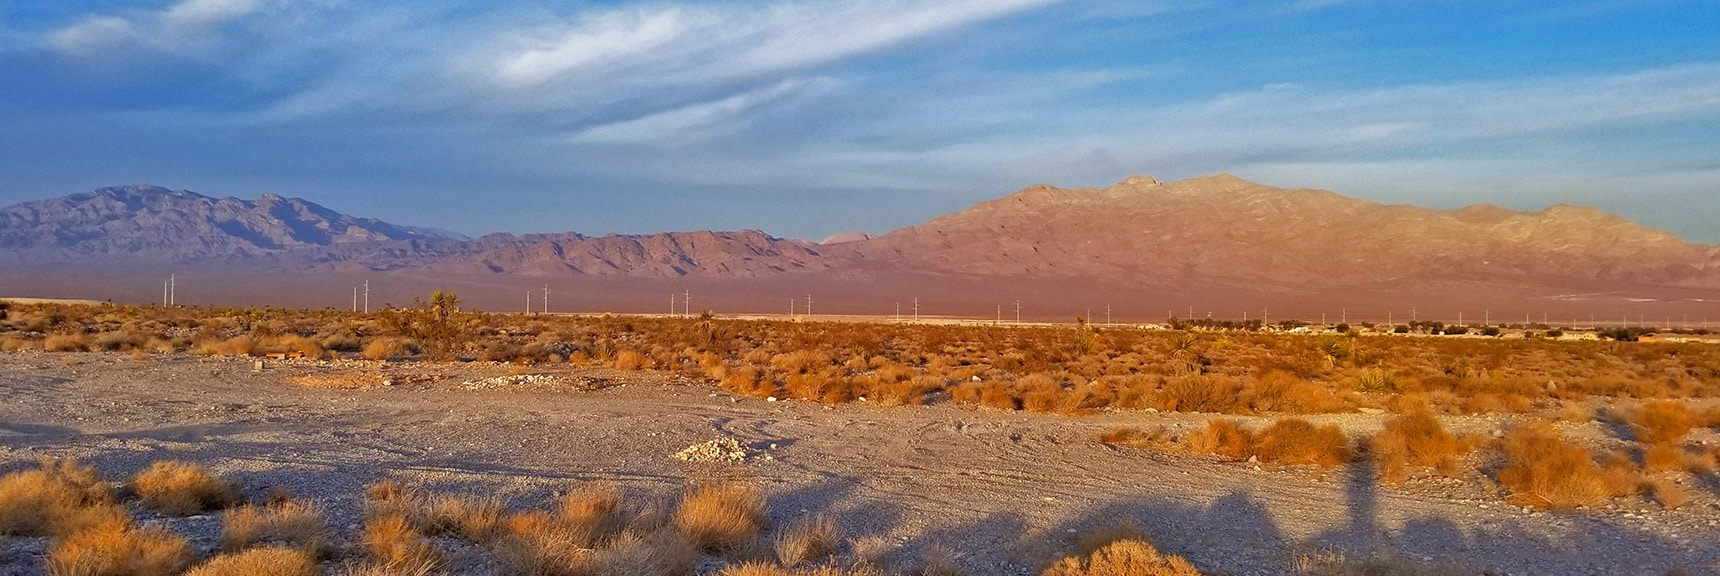 View from Skye Point Toward Sheep Range and Gass Peak | Snapshot of Las Vegas Northern Growth Edge on January 3, 2021